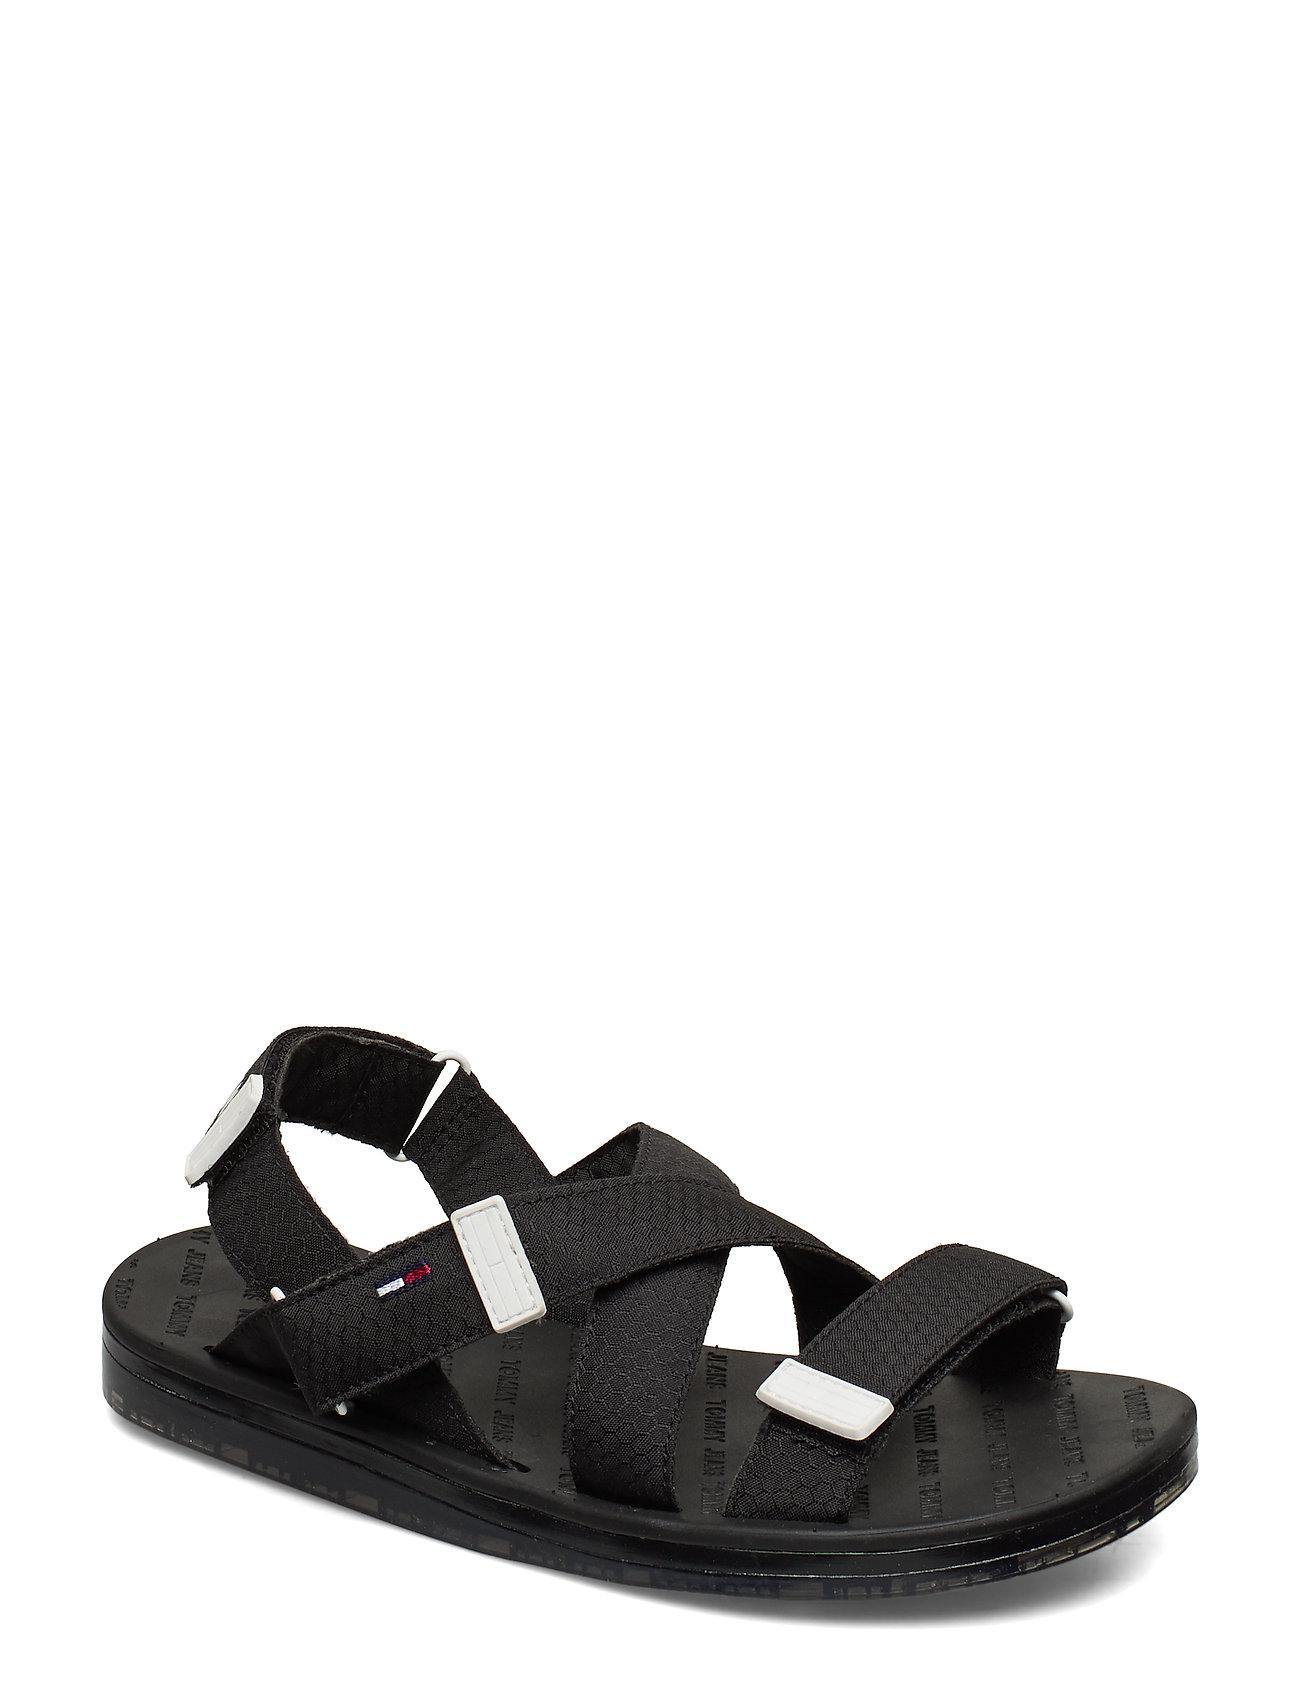 Image of Tommy Surplus Flat Sandal Shoes Summer Shoes Flat Sandals Sort Tommy Hilfiger (3359211163)